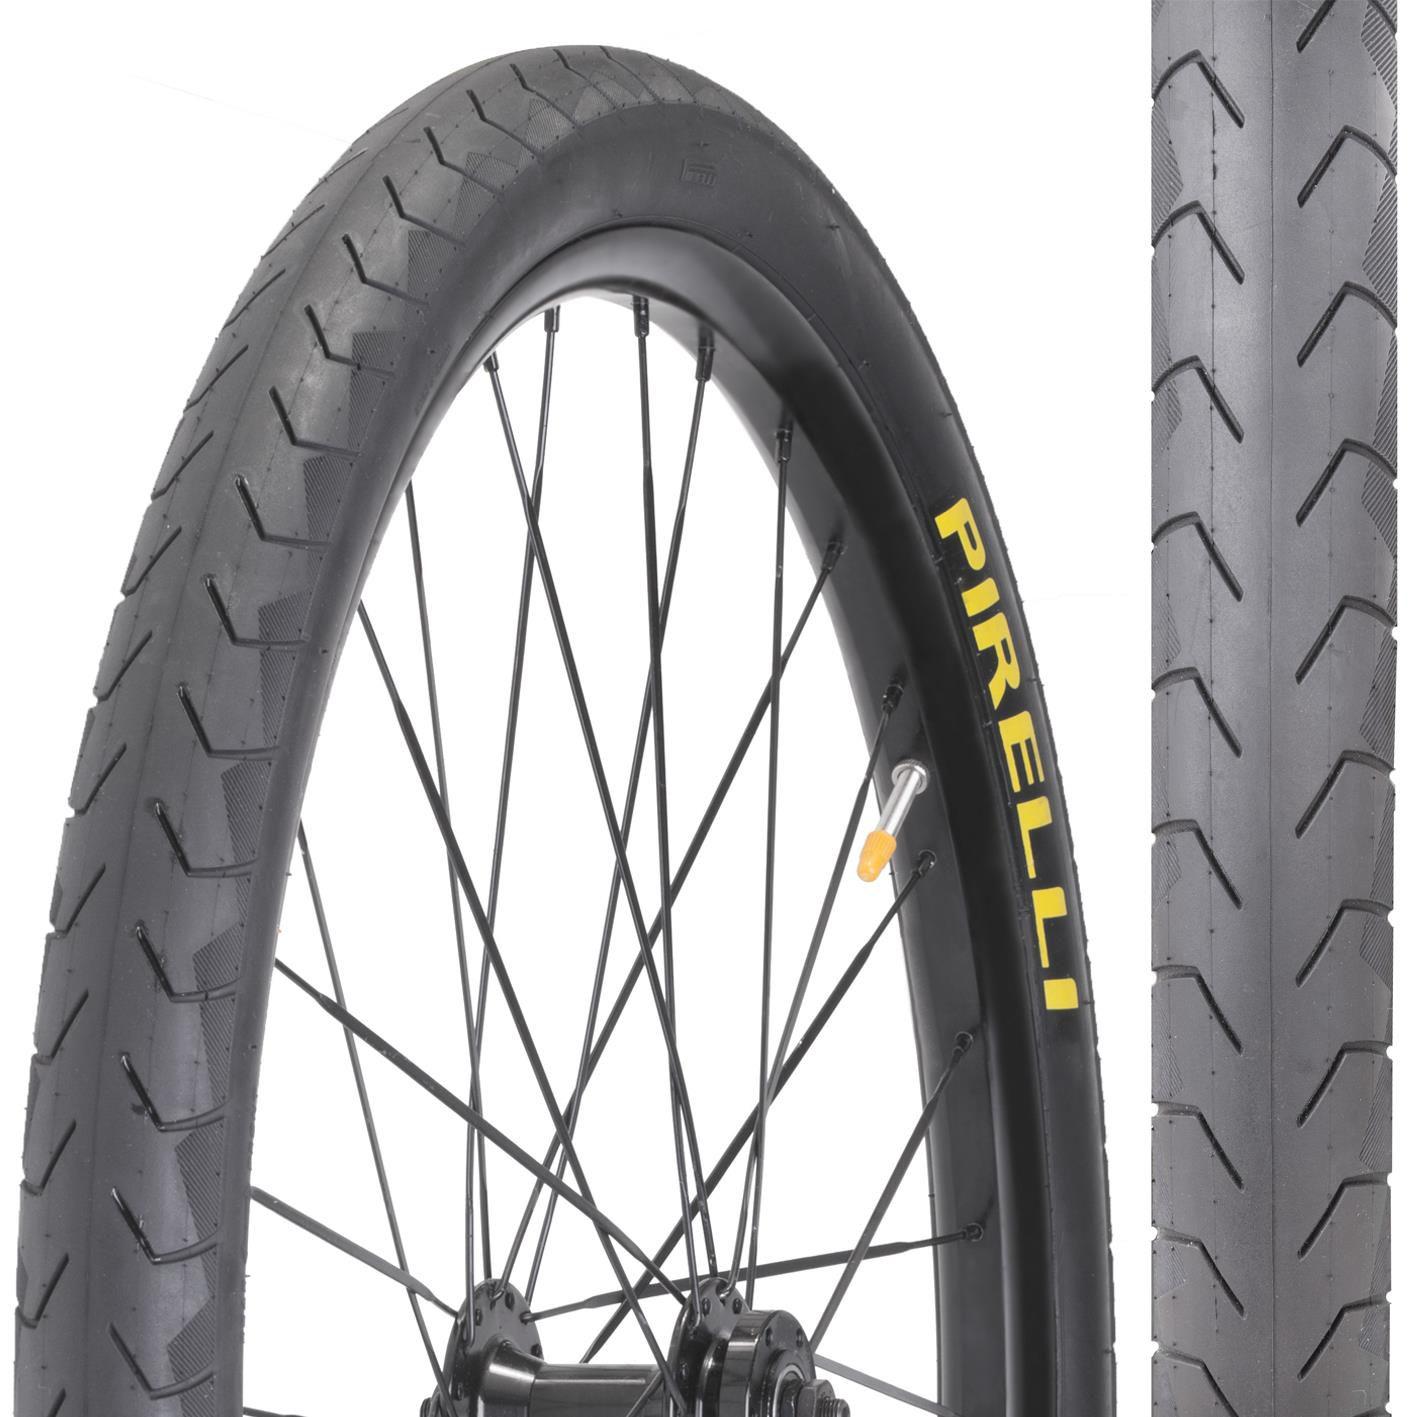 Par Pneu Pirelli 26 x 1.50 Phantom Street Slick Bike Bicicleta